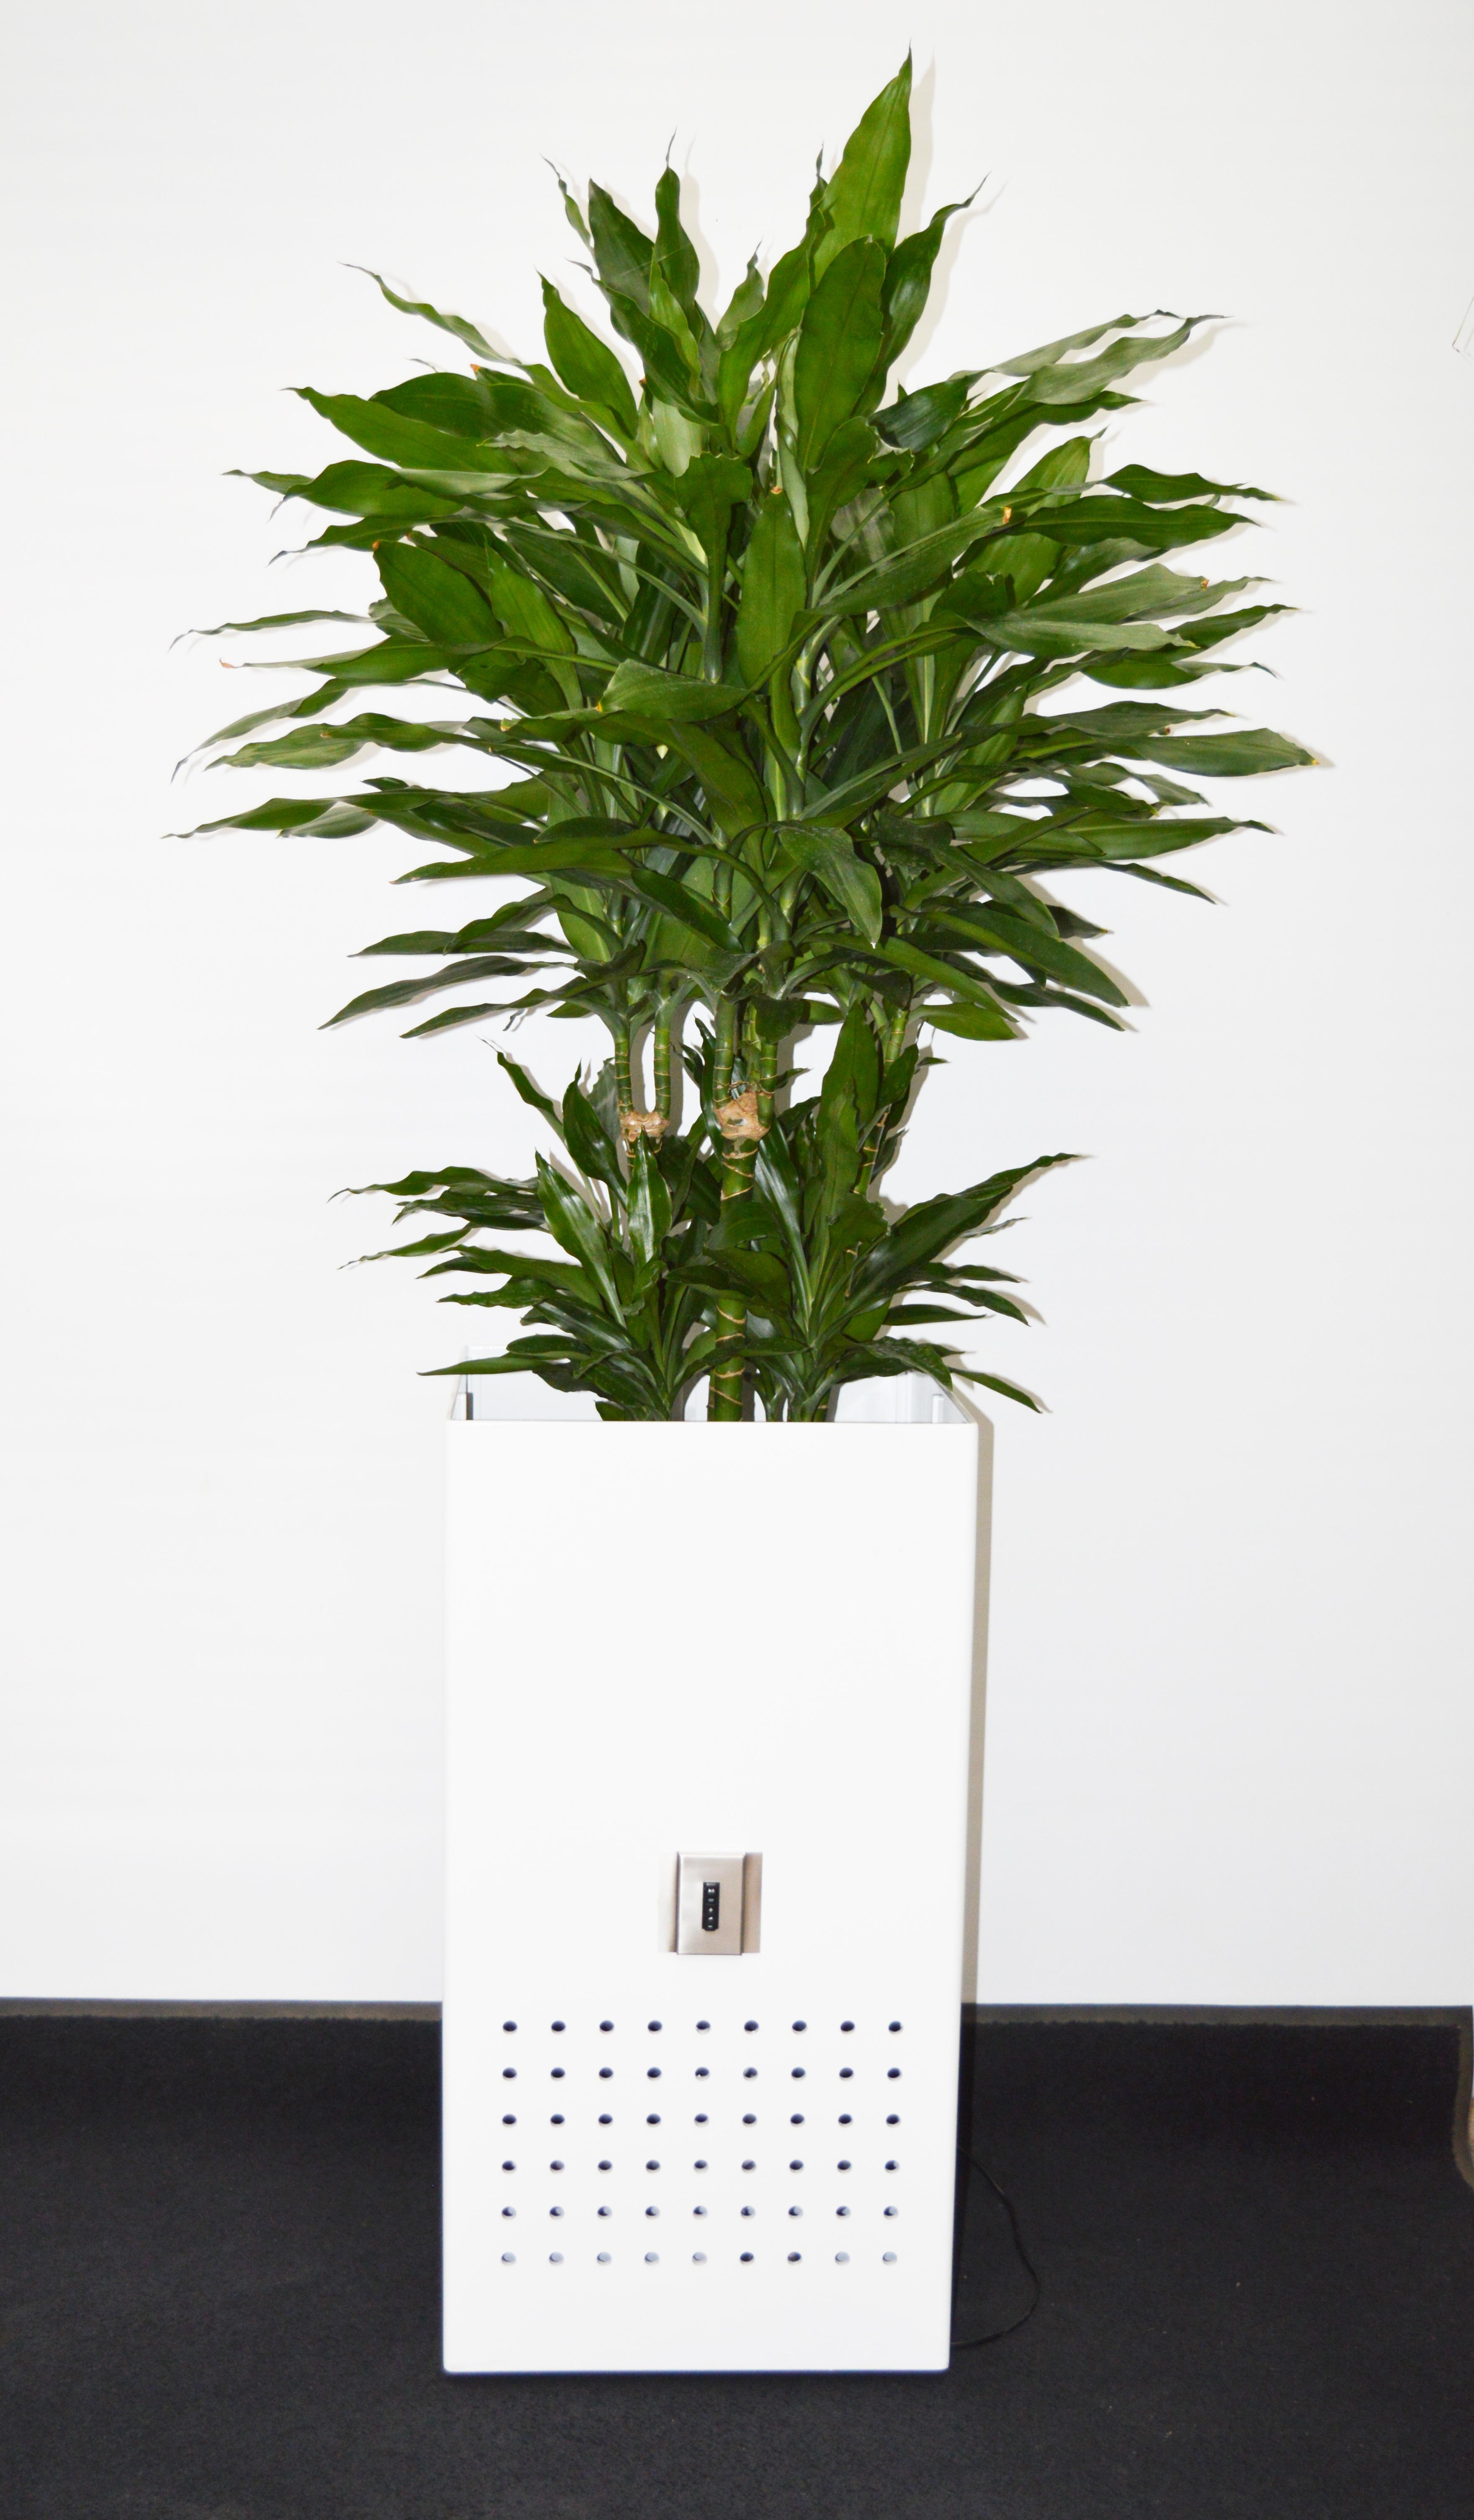 MM Box weiss hochglanz mit Dracaena fragrans